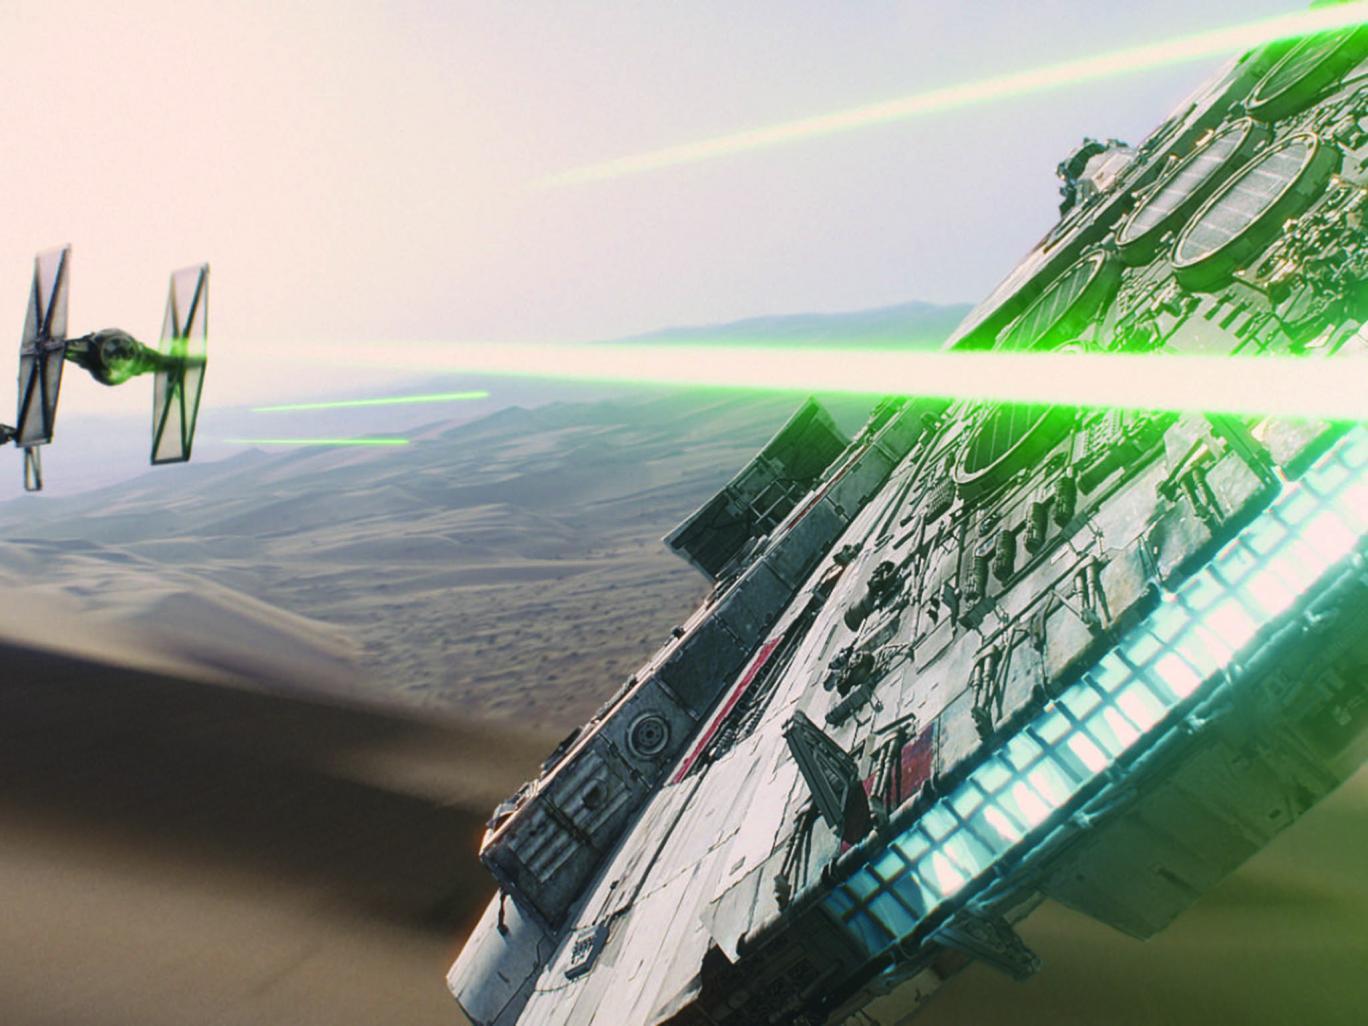 Star Wars: The Force Awakens Lucasfilm 2015